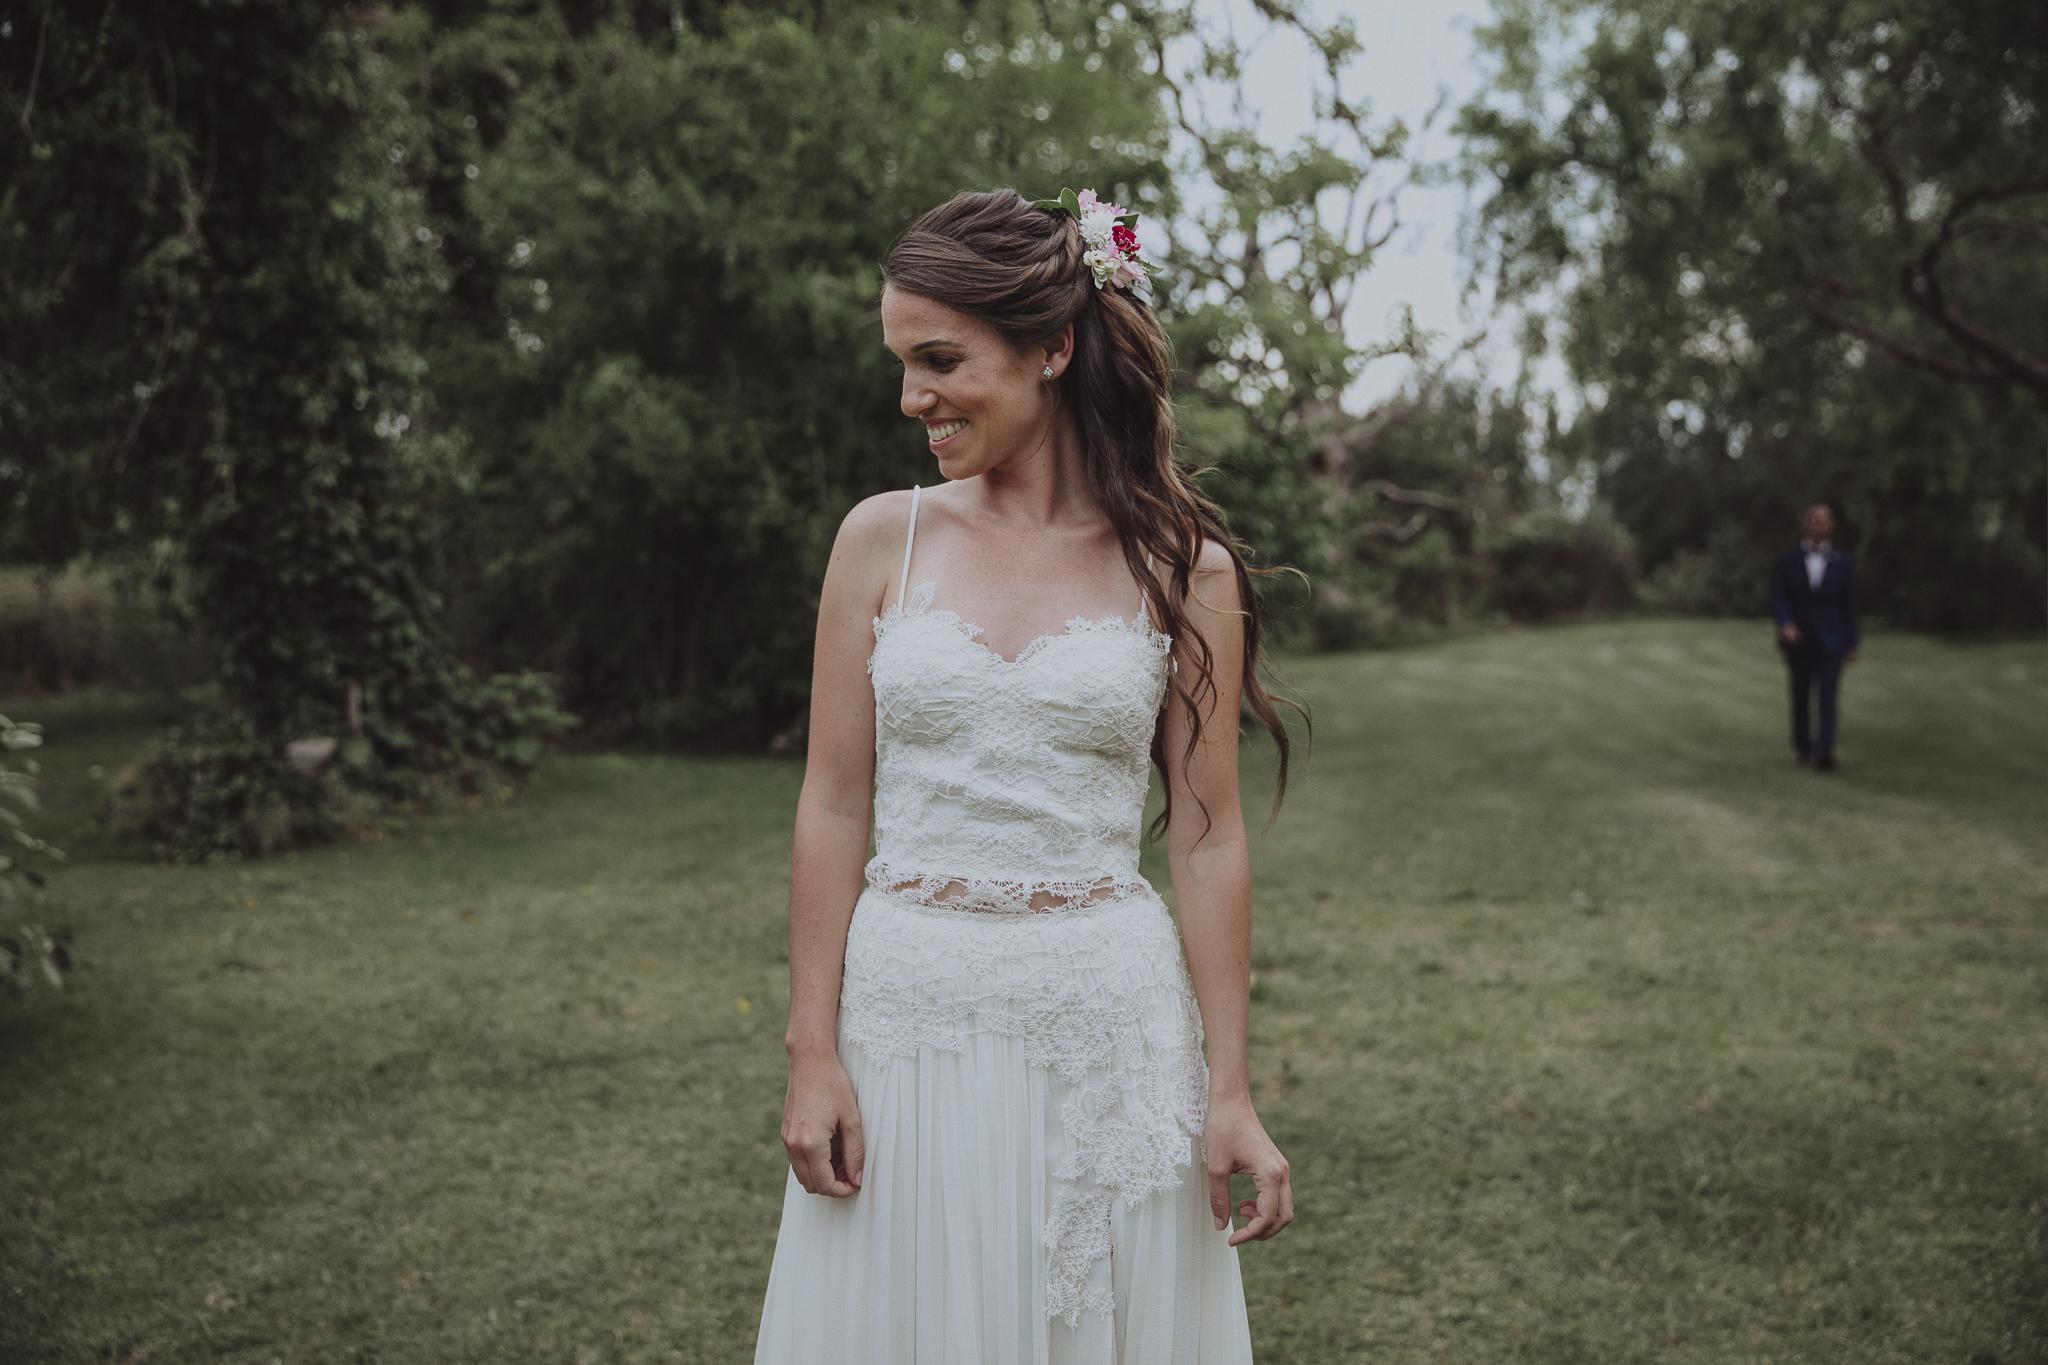 una boda diferente - first look - uruguay - nye